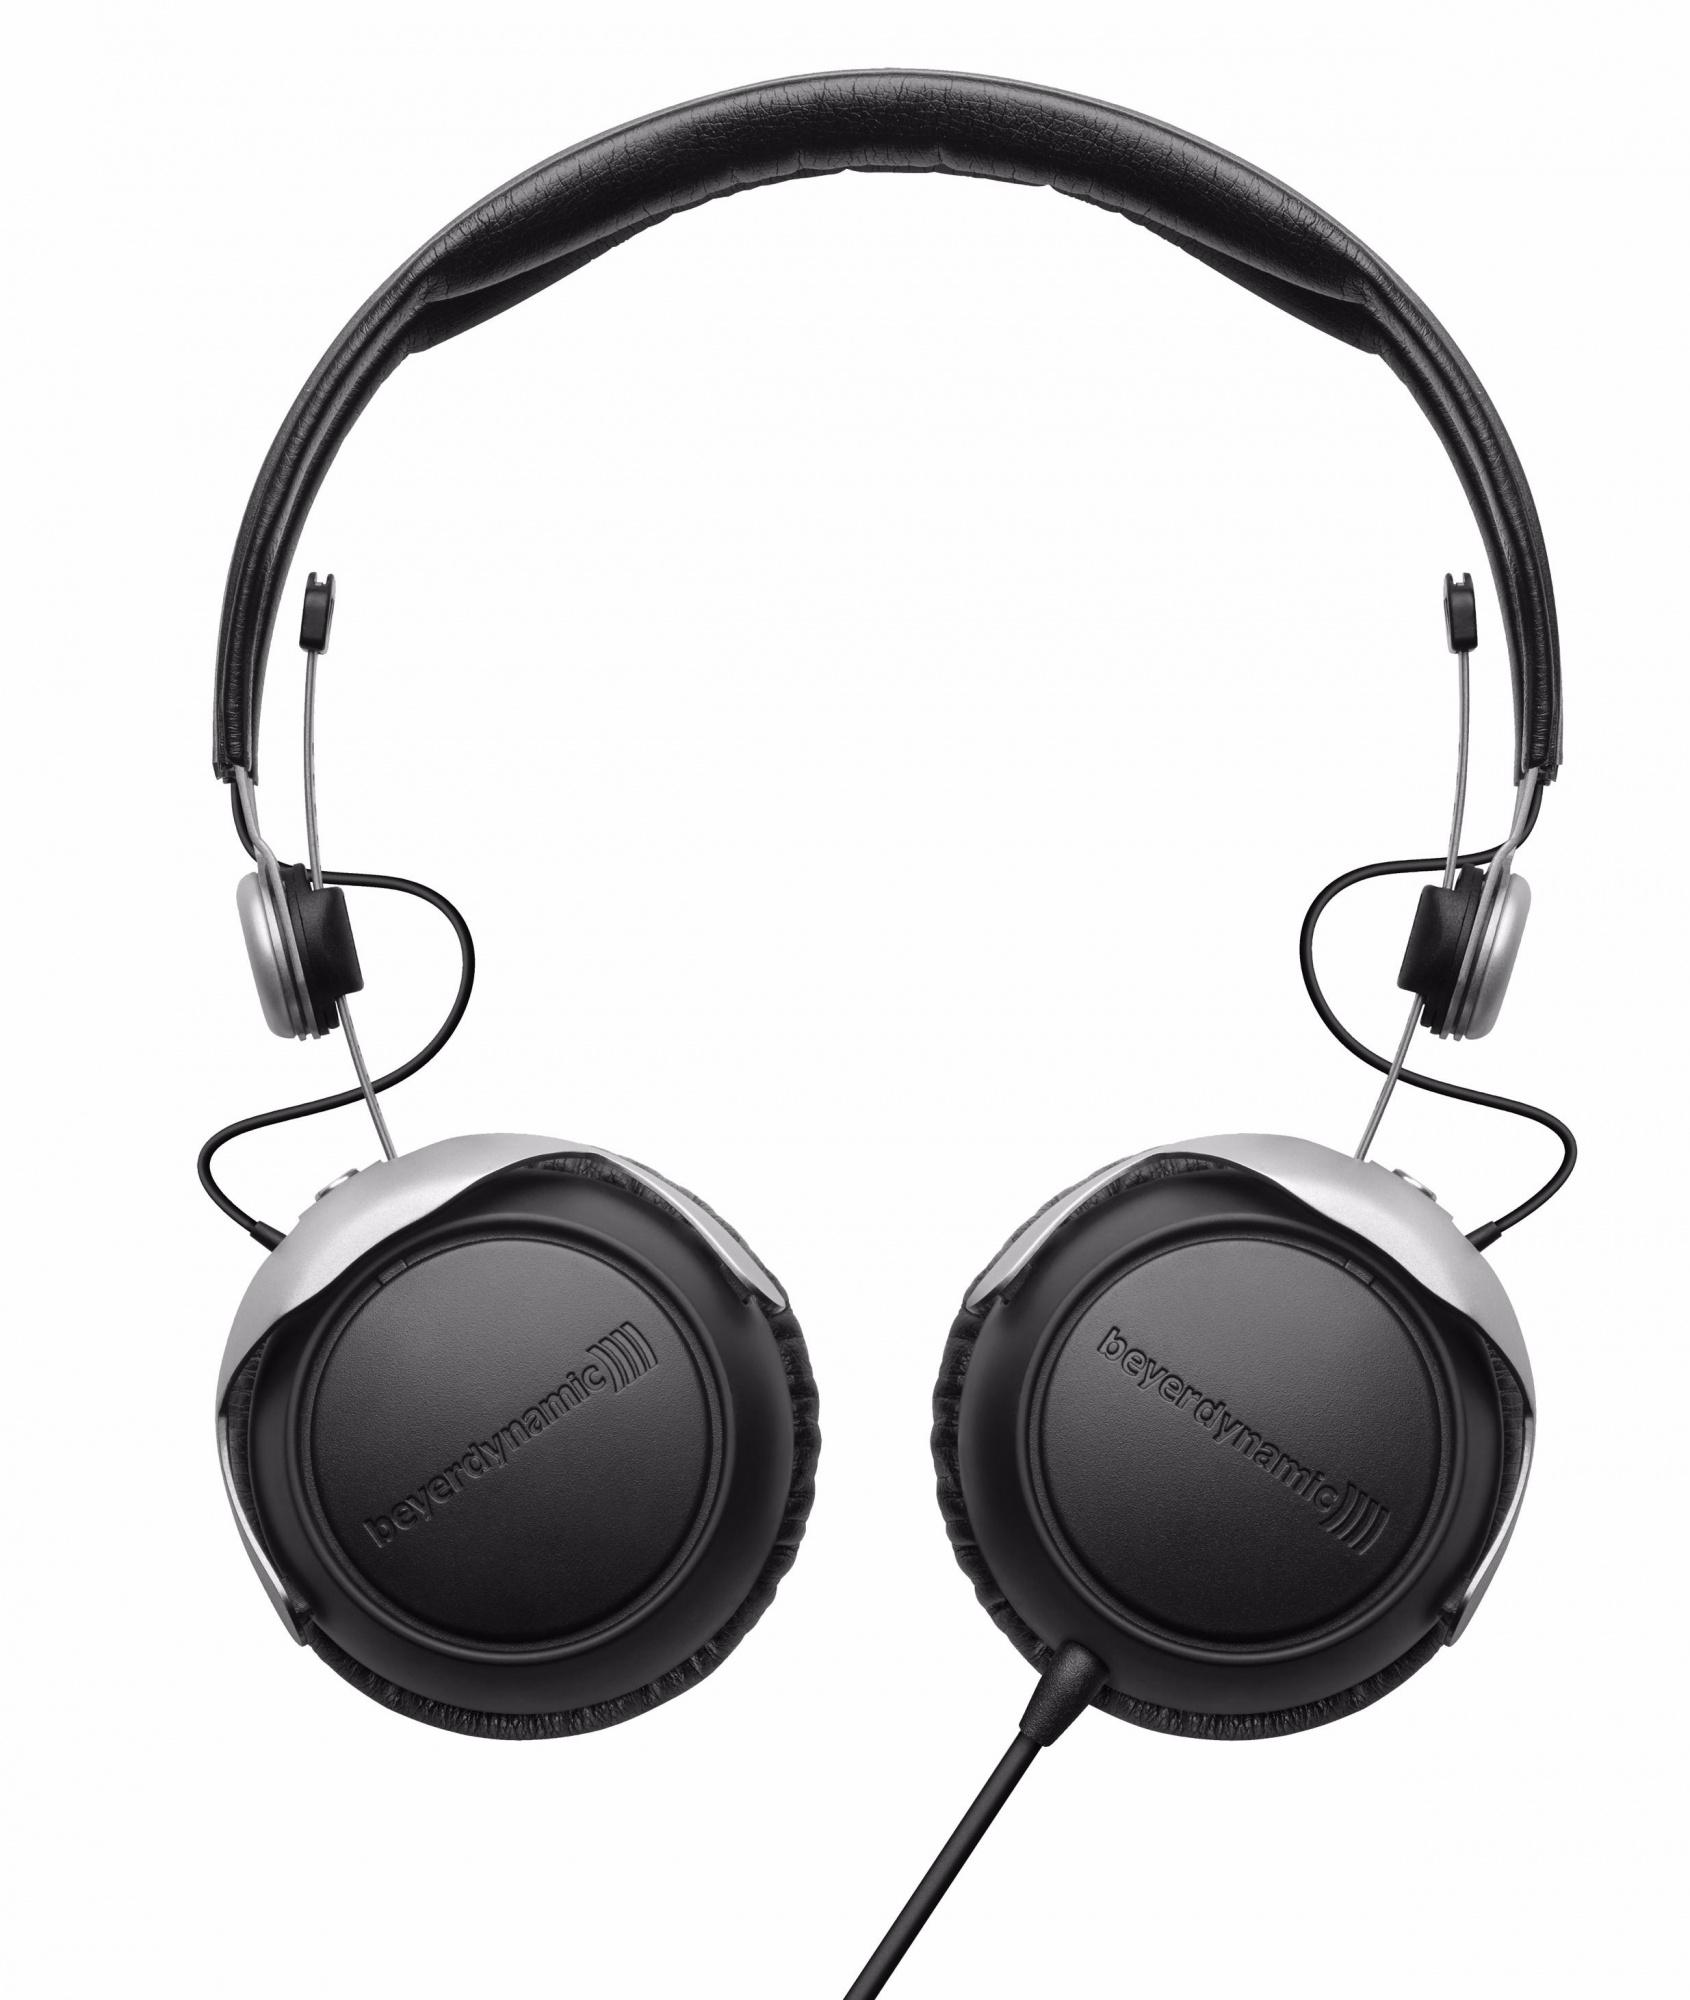 Beyerdynamic DT 1350 - мониторные наушники (Black)